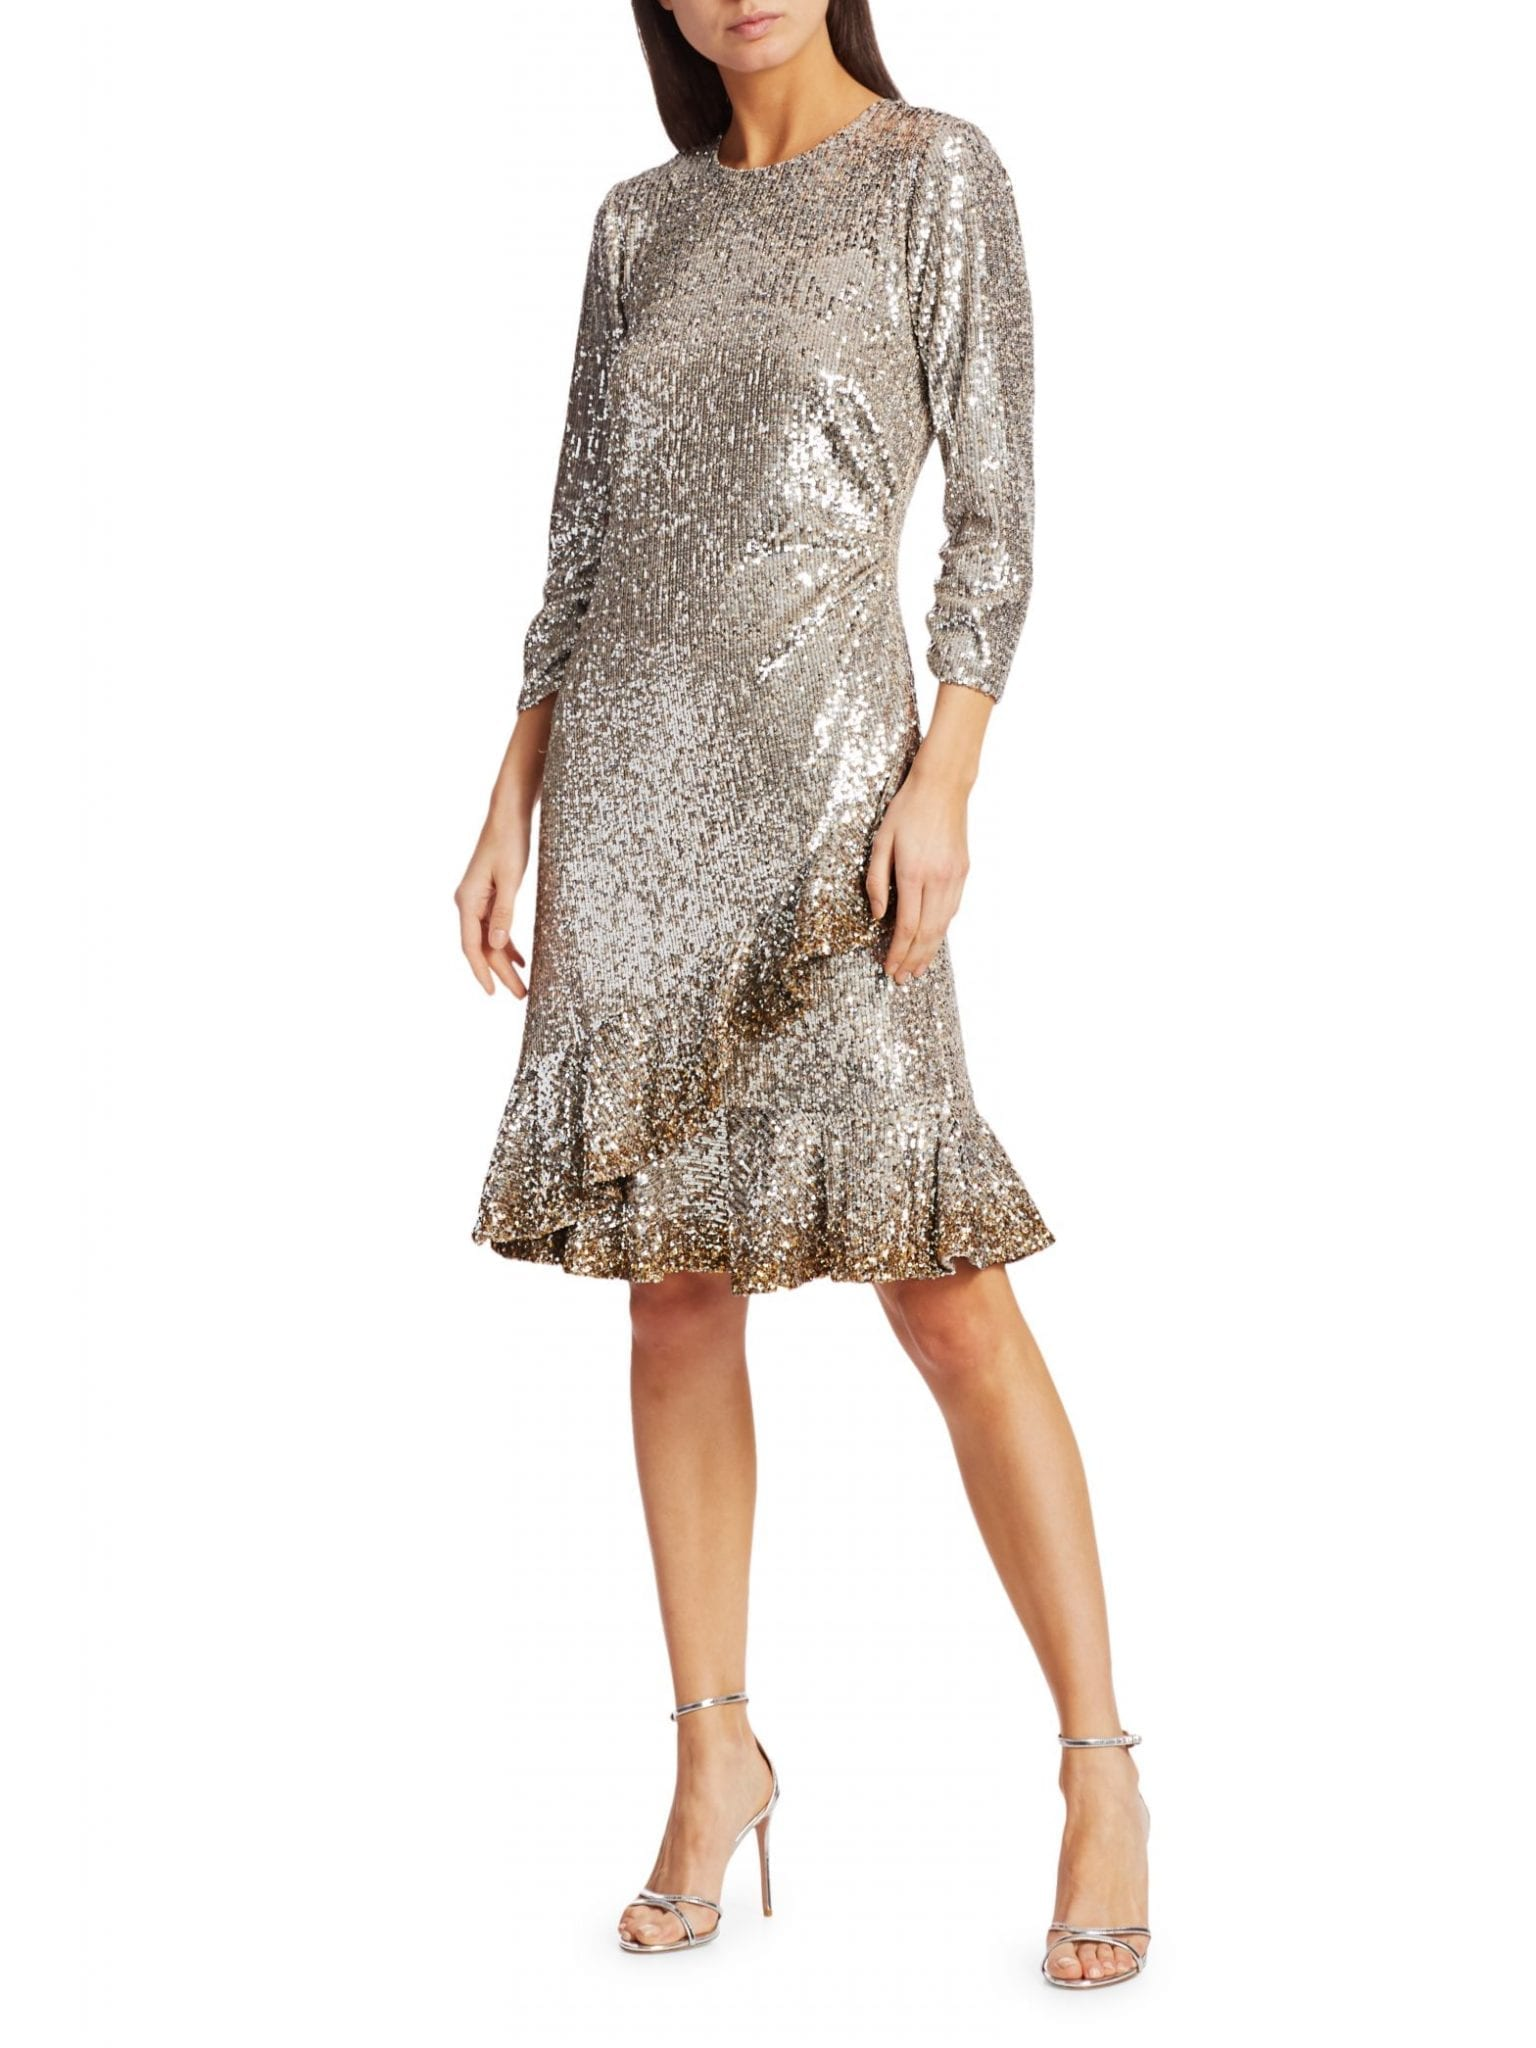 AHLUWALIA Sequin Ruffle-Hem Dress